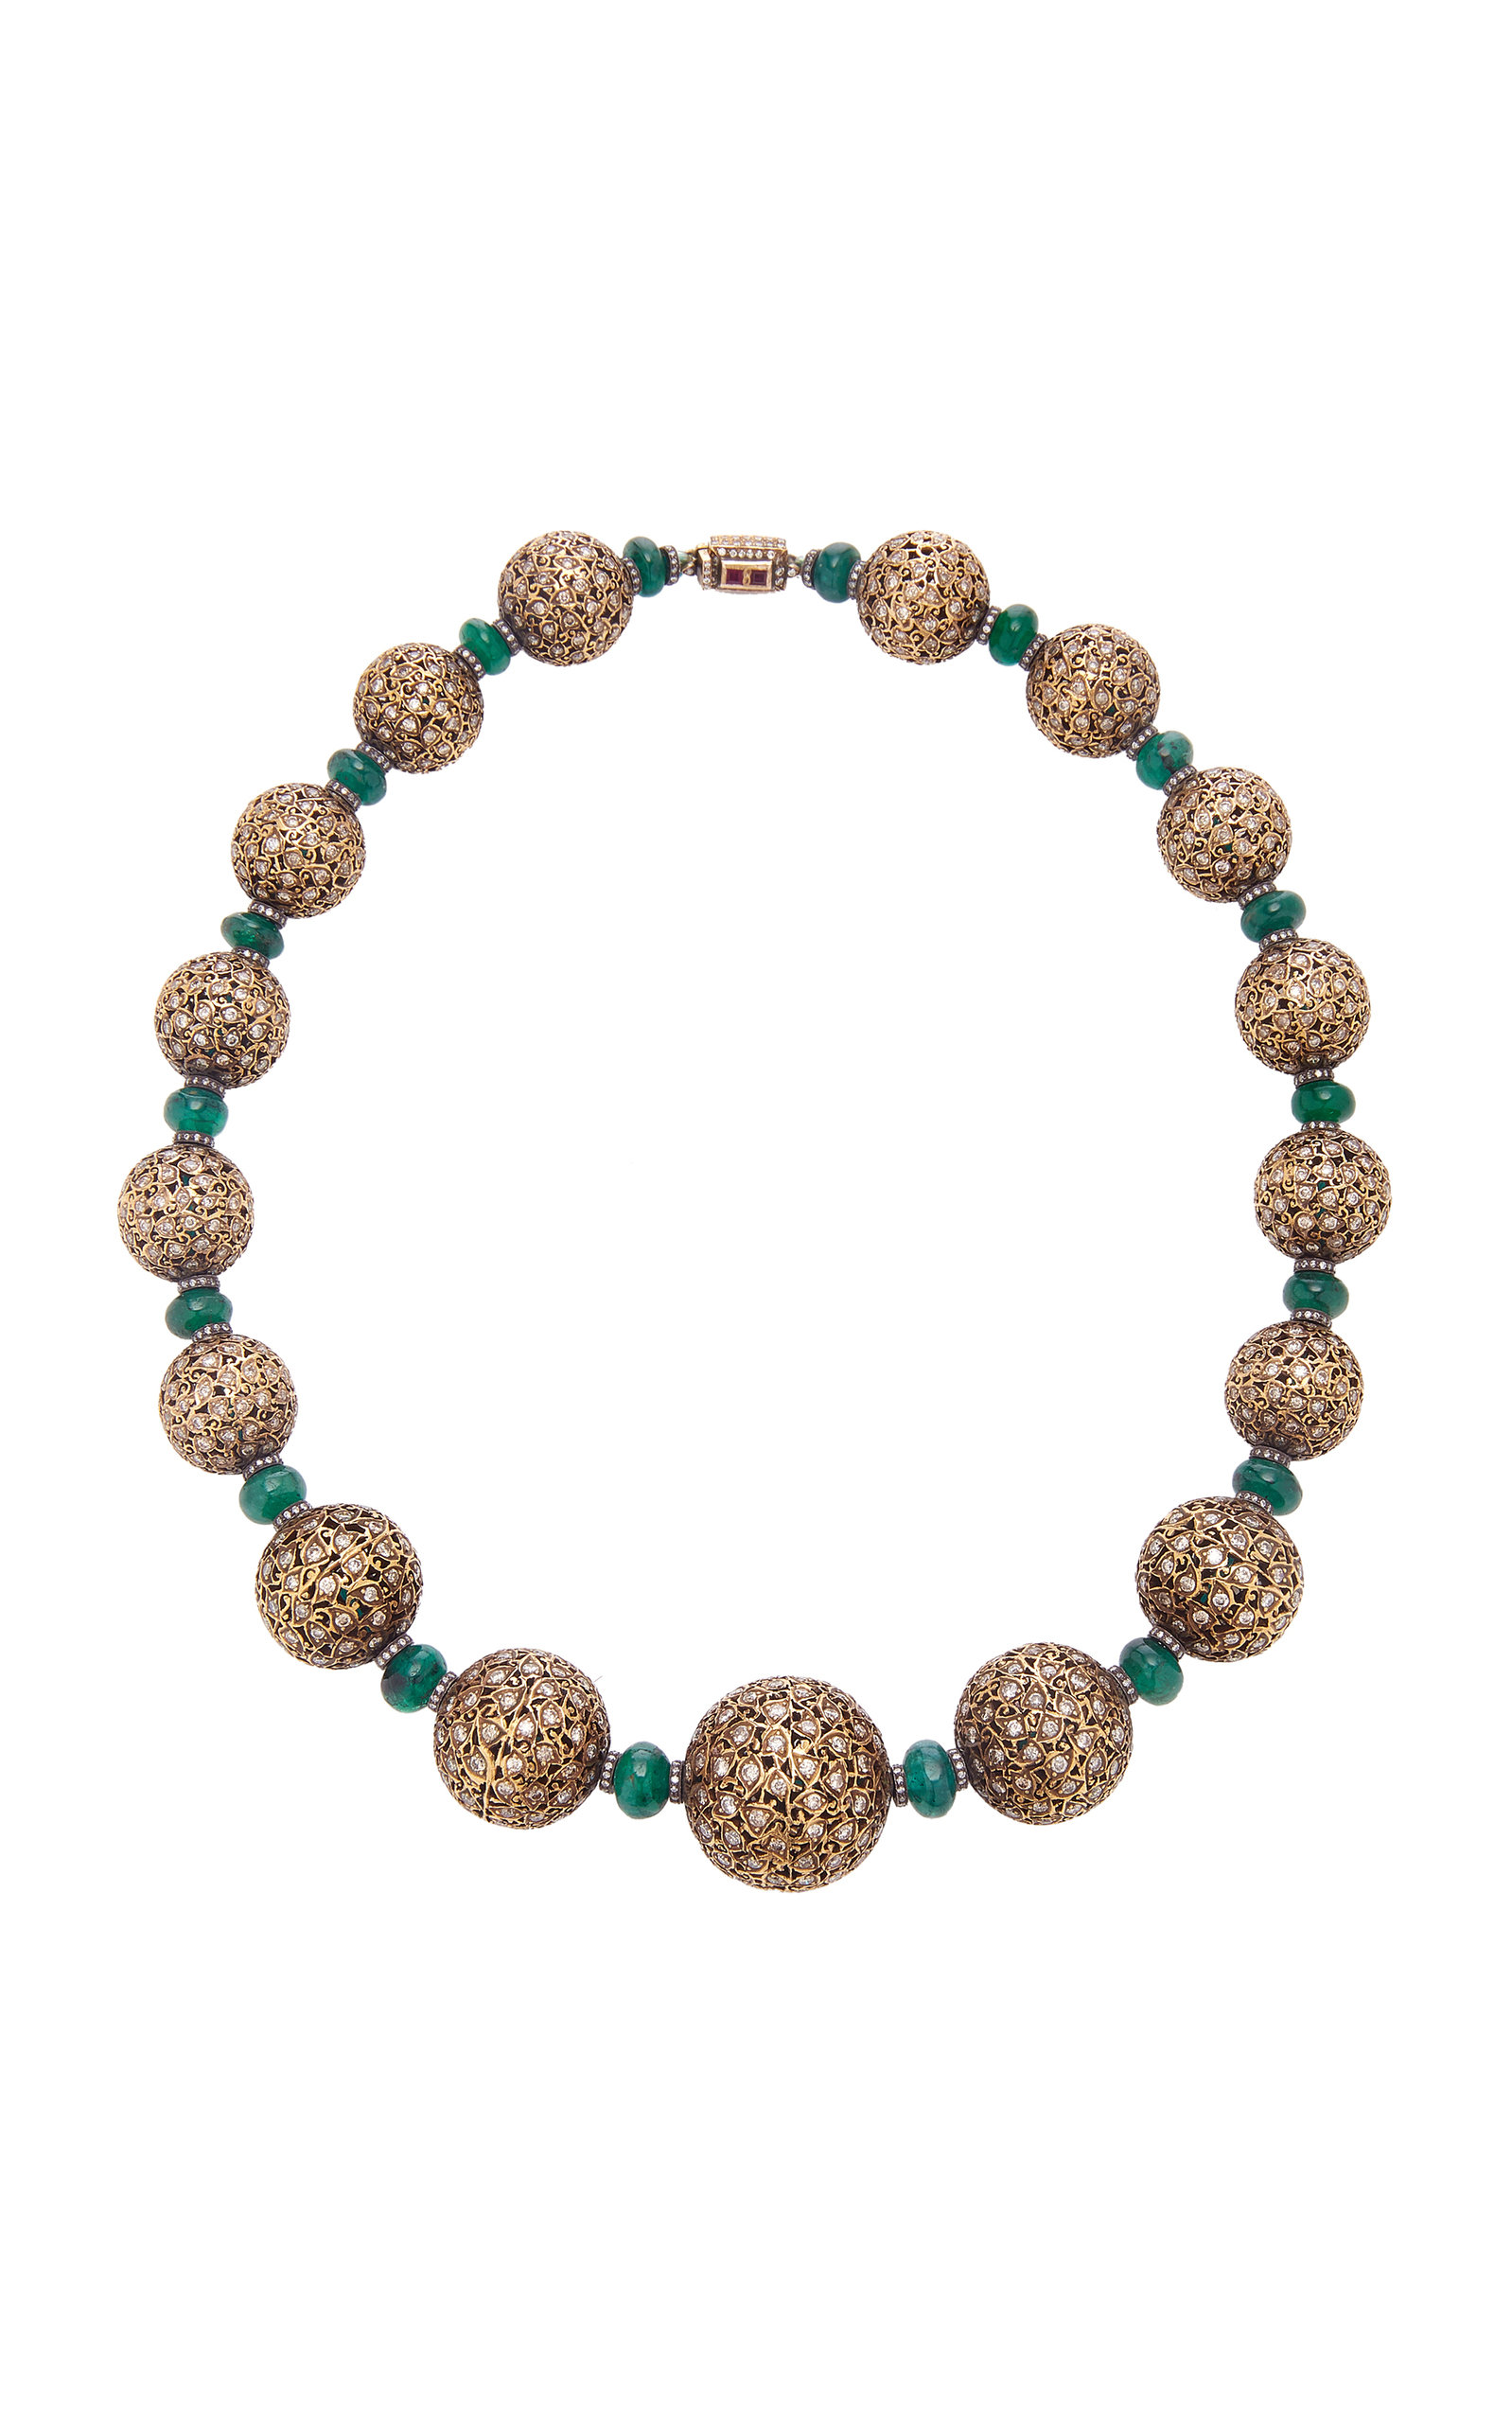 SANJAY KASLIWAL 18K Gold Emerald And Diamond Necklace